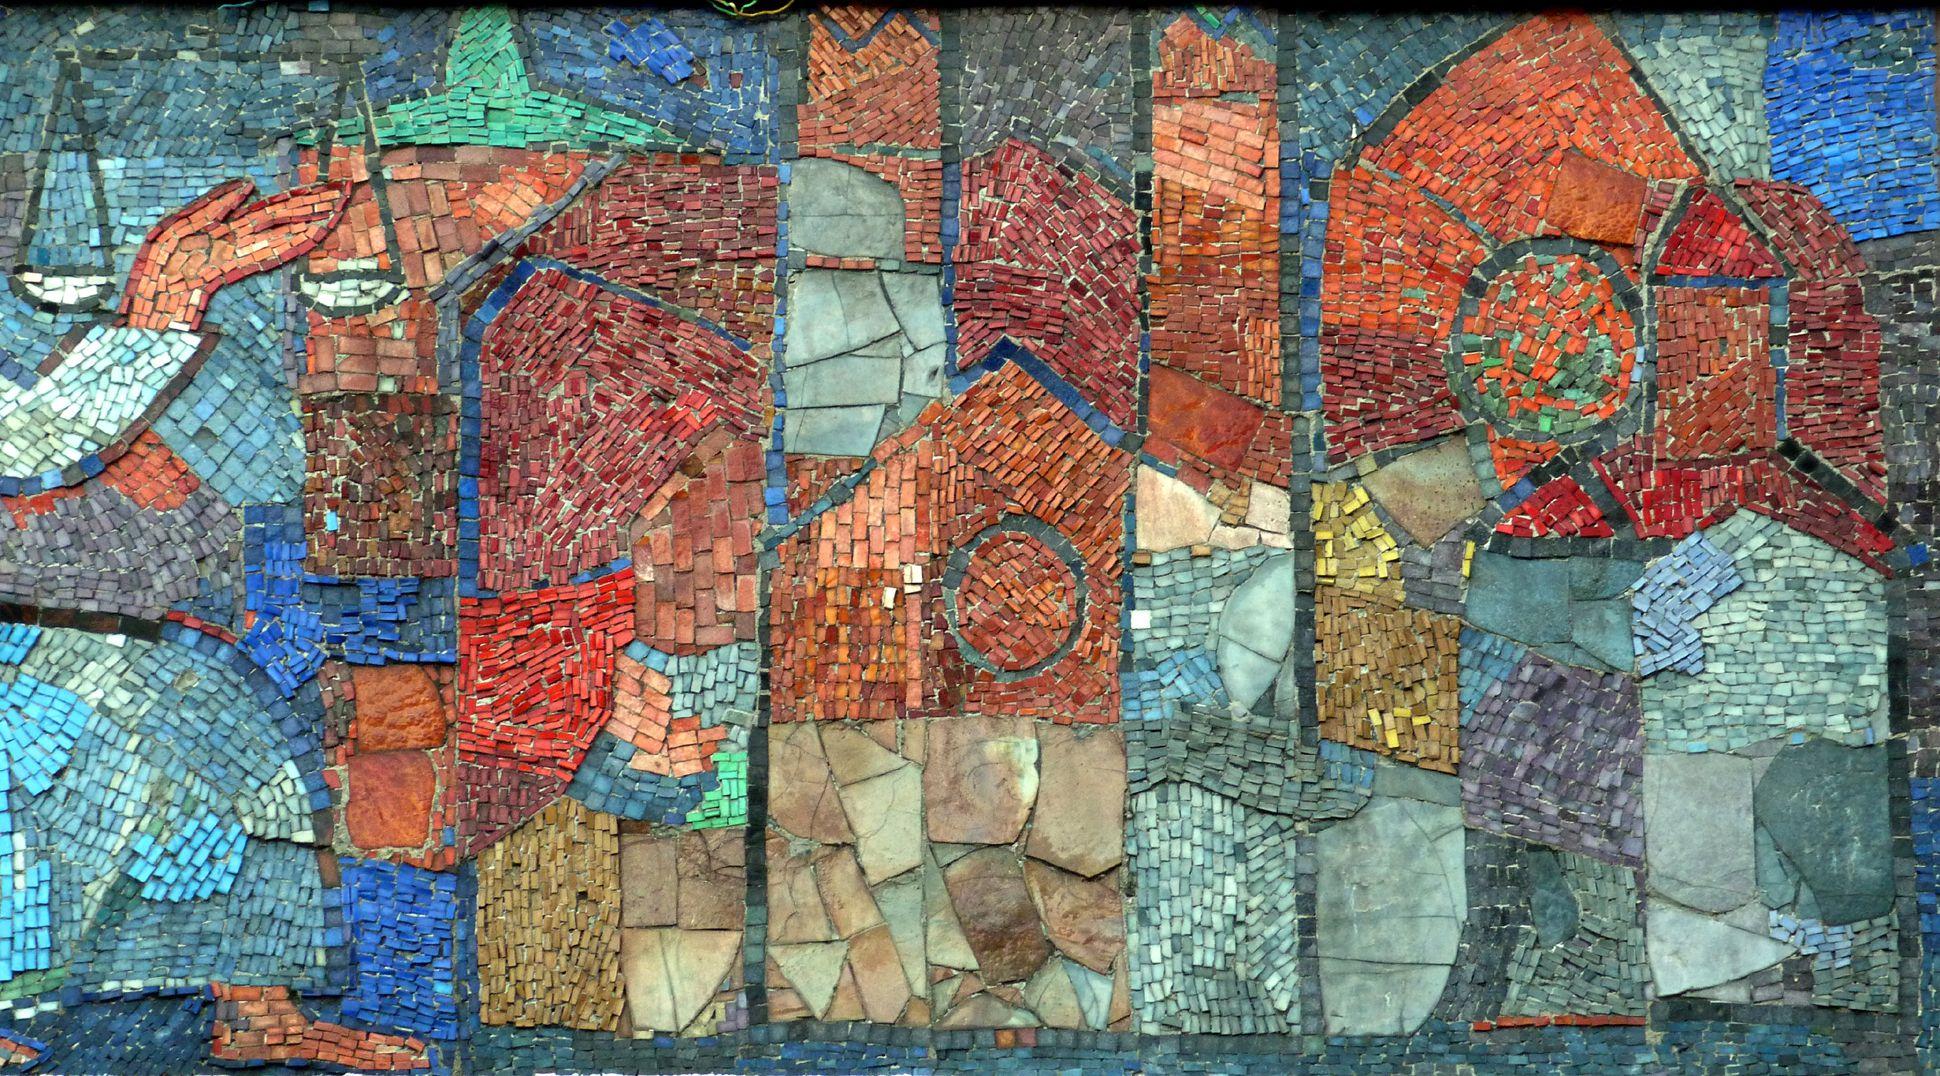 Mosaik am Hauptmarkt in Nürnberg abstrahierte Nürnberger Stadtbauten: Dicker Stadtmauerturm, Lorenzkirche und Frauenkirche